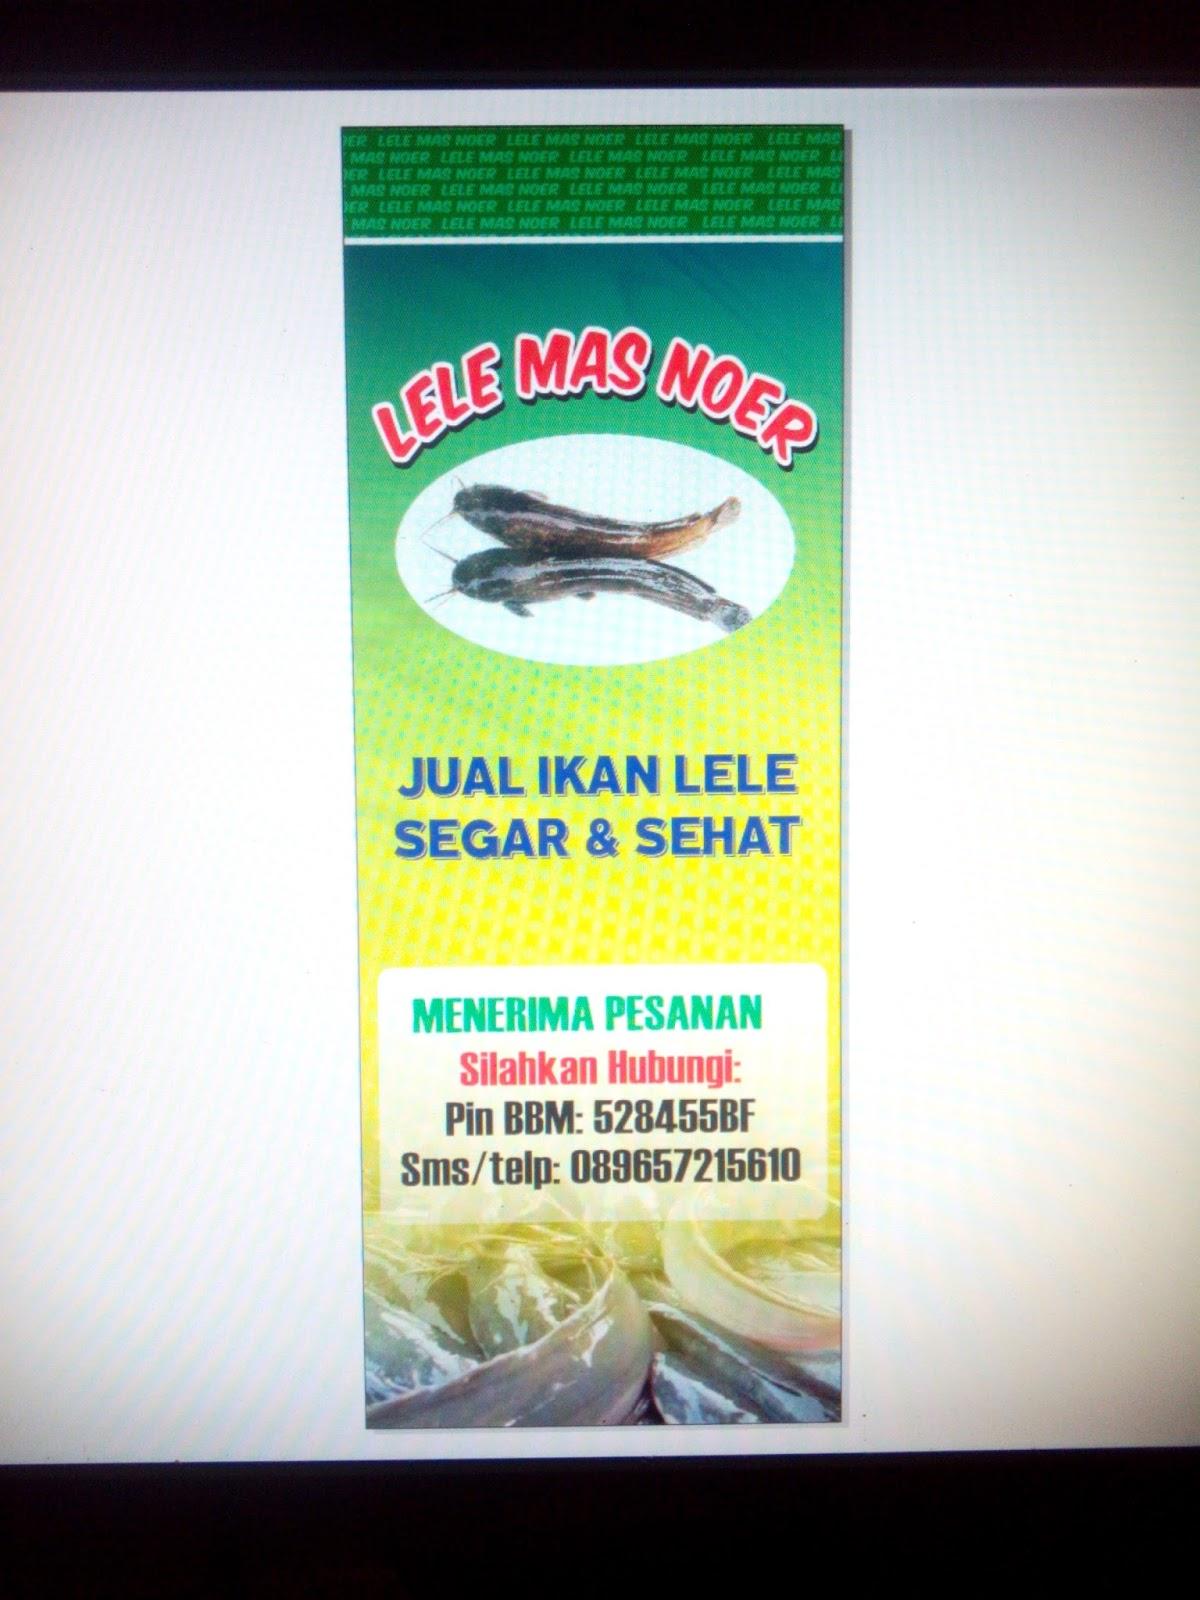 Contoh Spanduk Jual Ikan Lele - desain spanduk keren